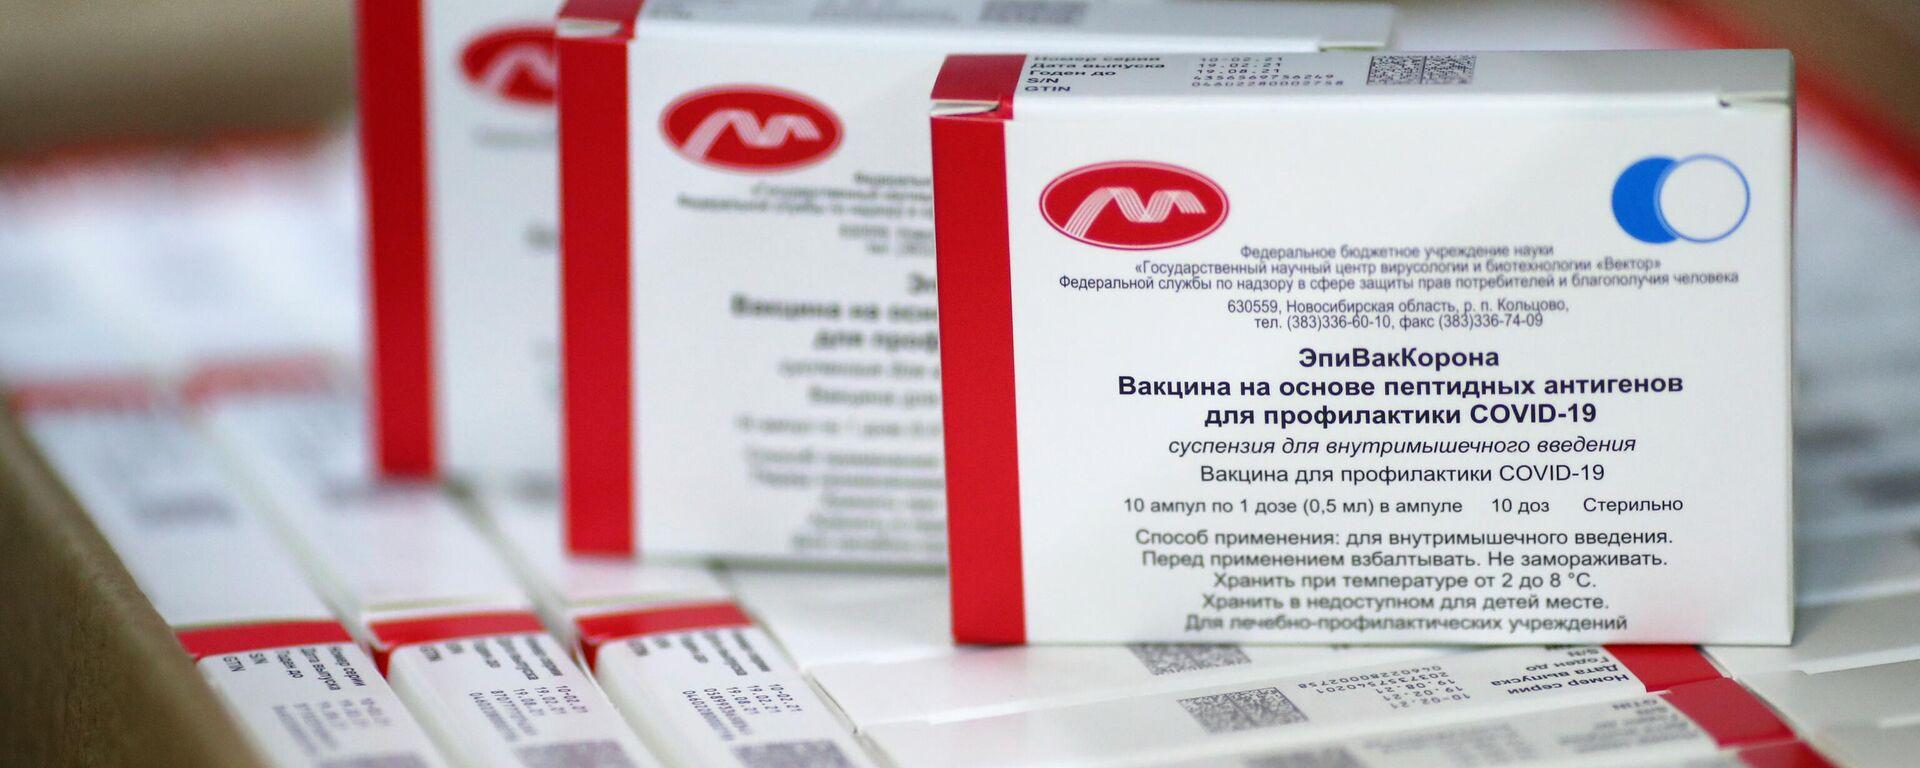 Vacuna anti-COVID rusa EpiVacCorona - Sputnik Mundo, 1920, 04.06.2021